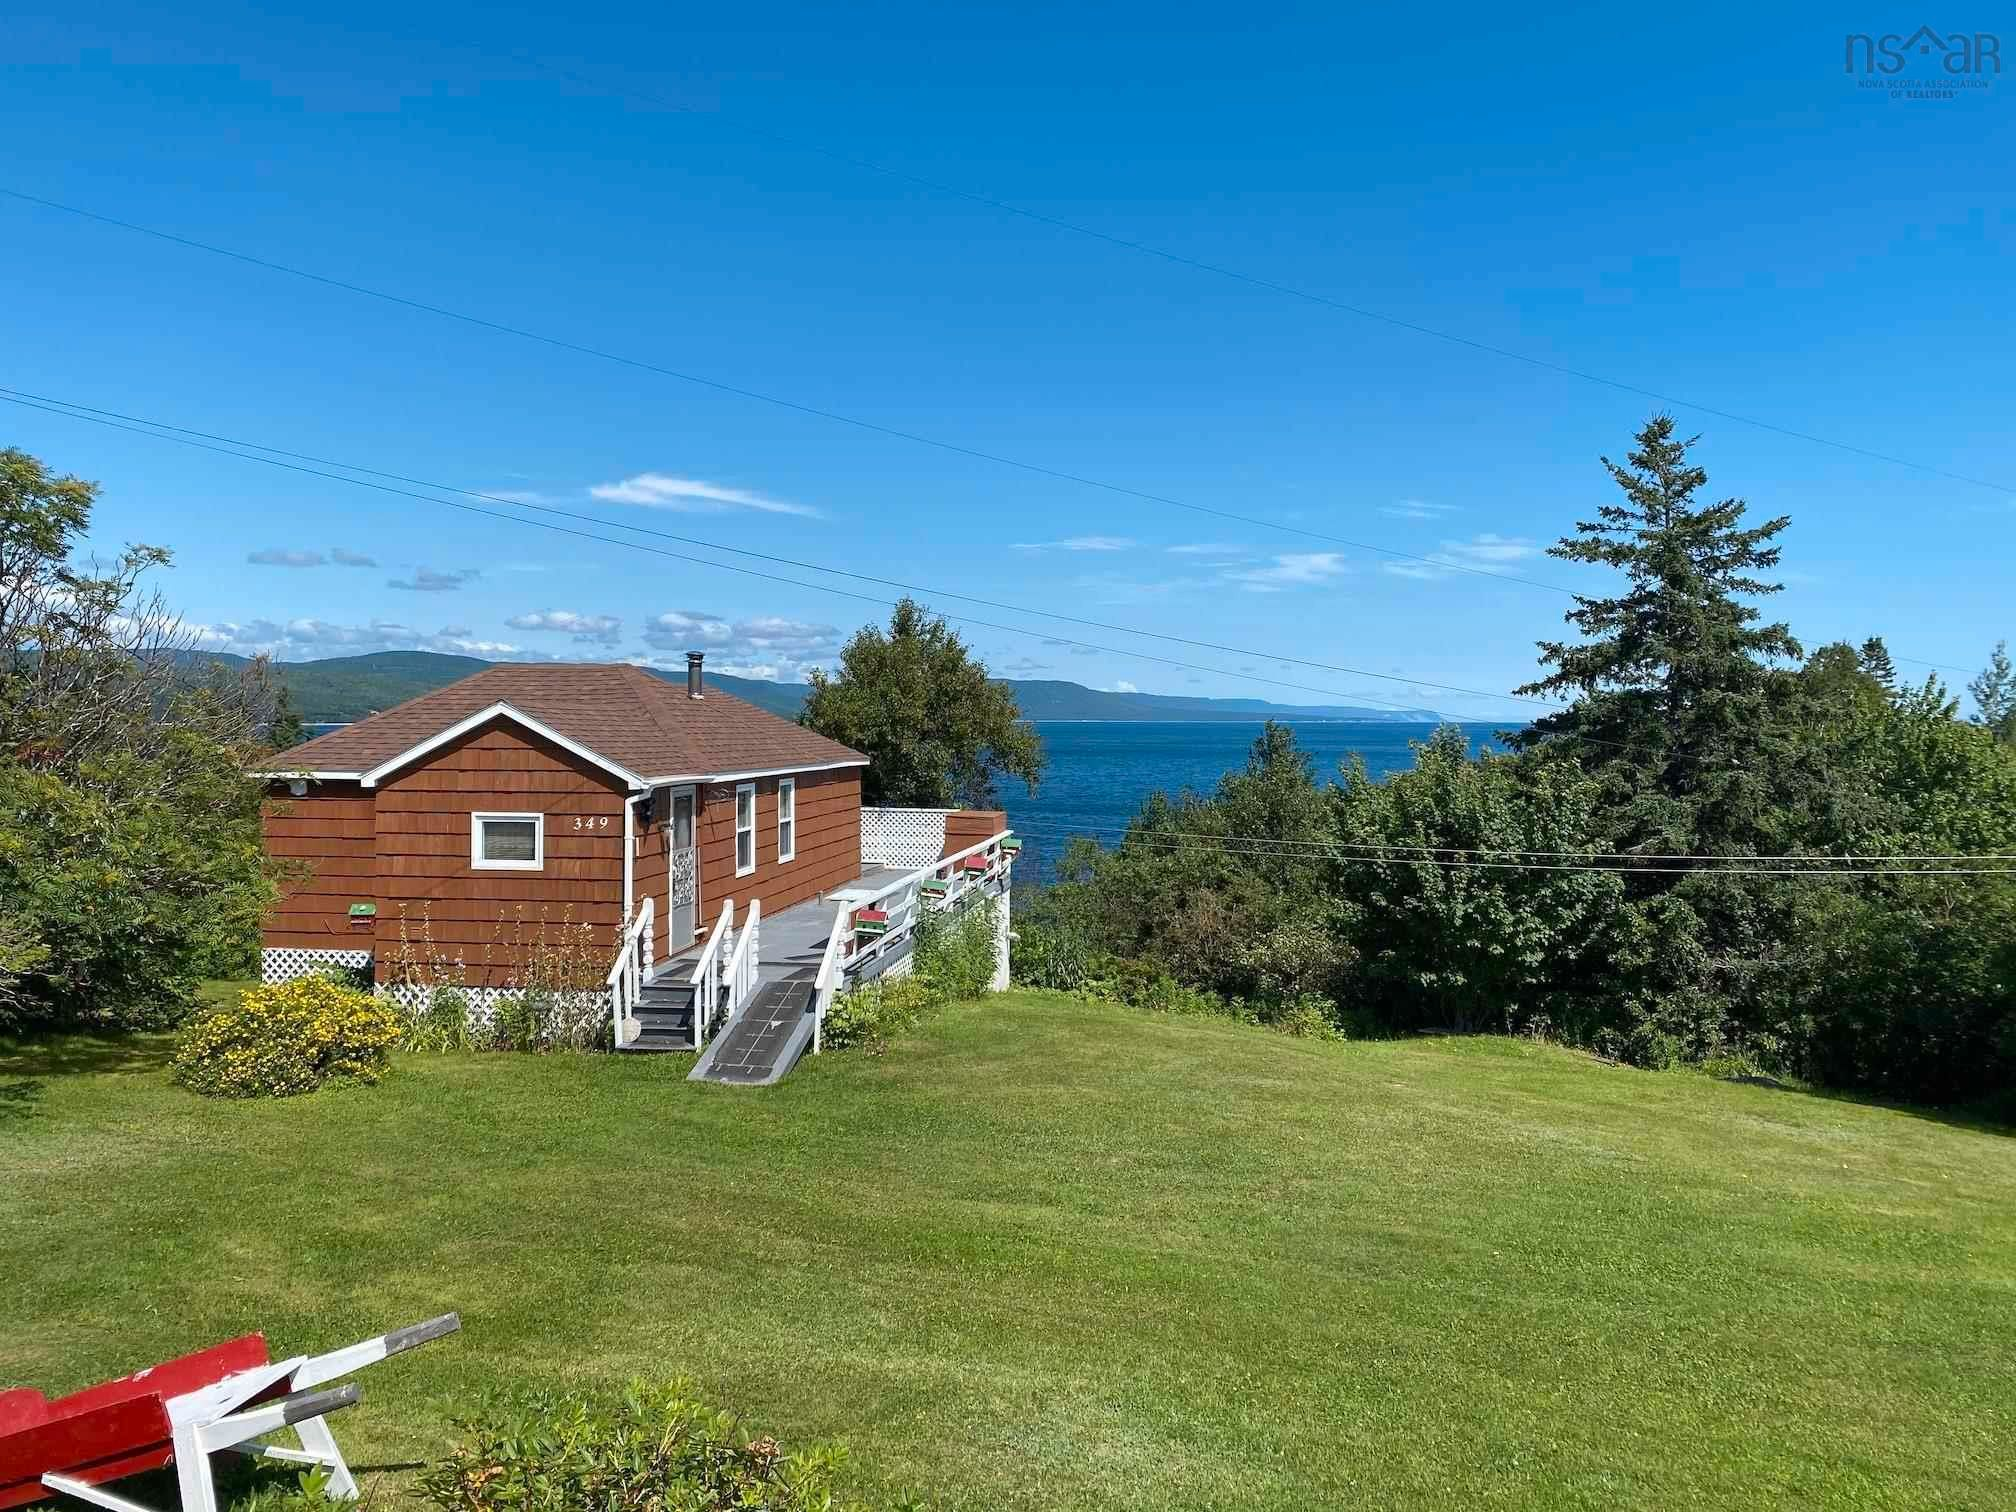 Main Photo: 349 Black Head Road in Englishtown: 209-Victoria County / Baddeck Residential for sale (Cape Breton)  : MLS®# 202121386